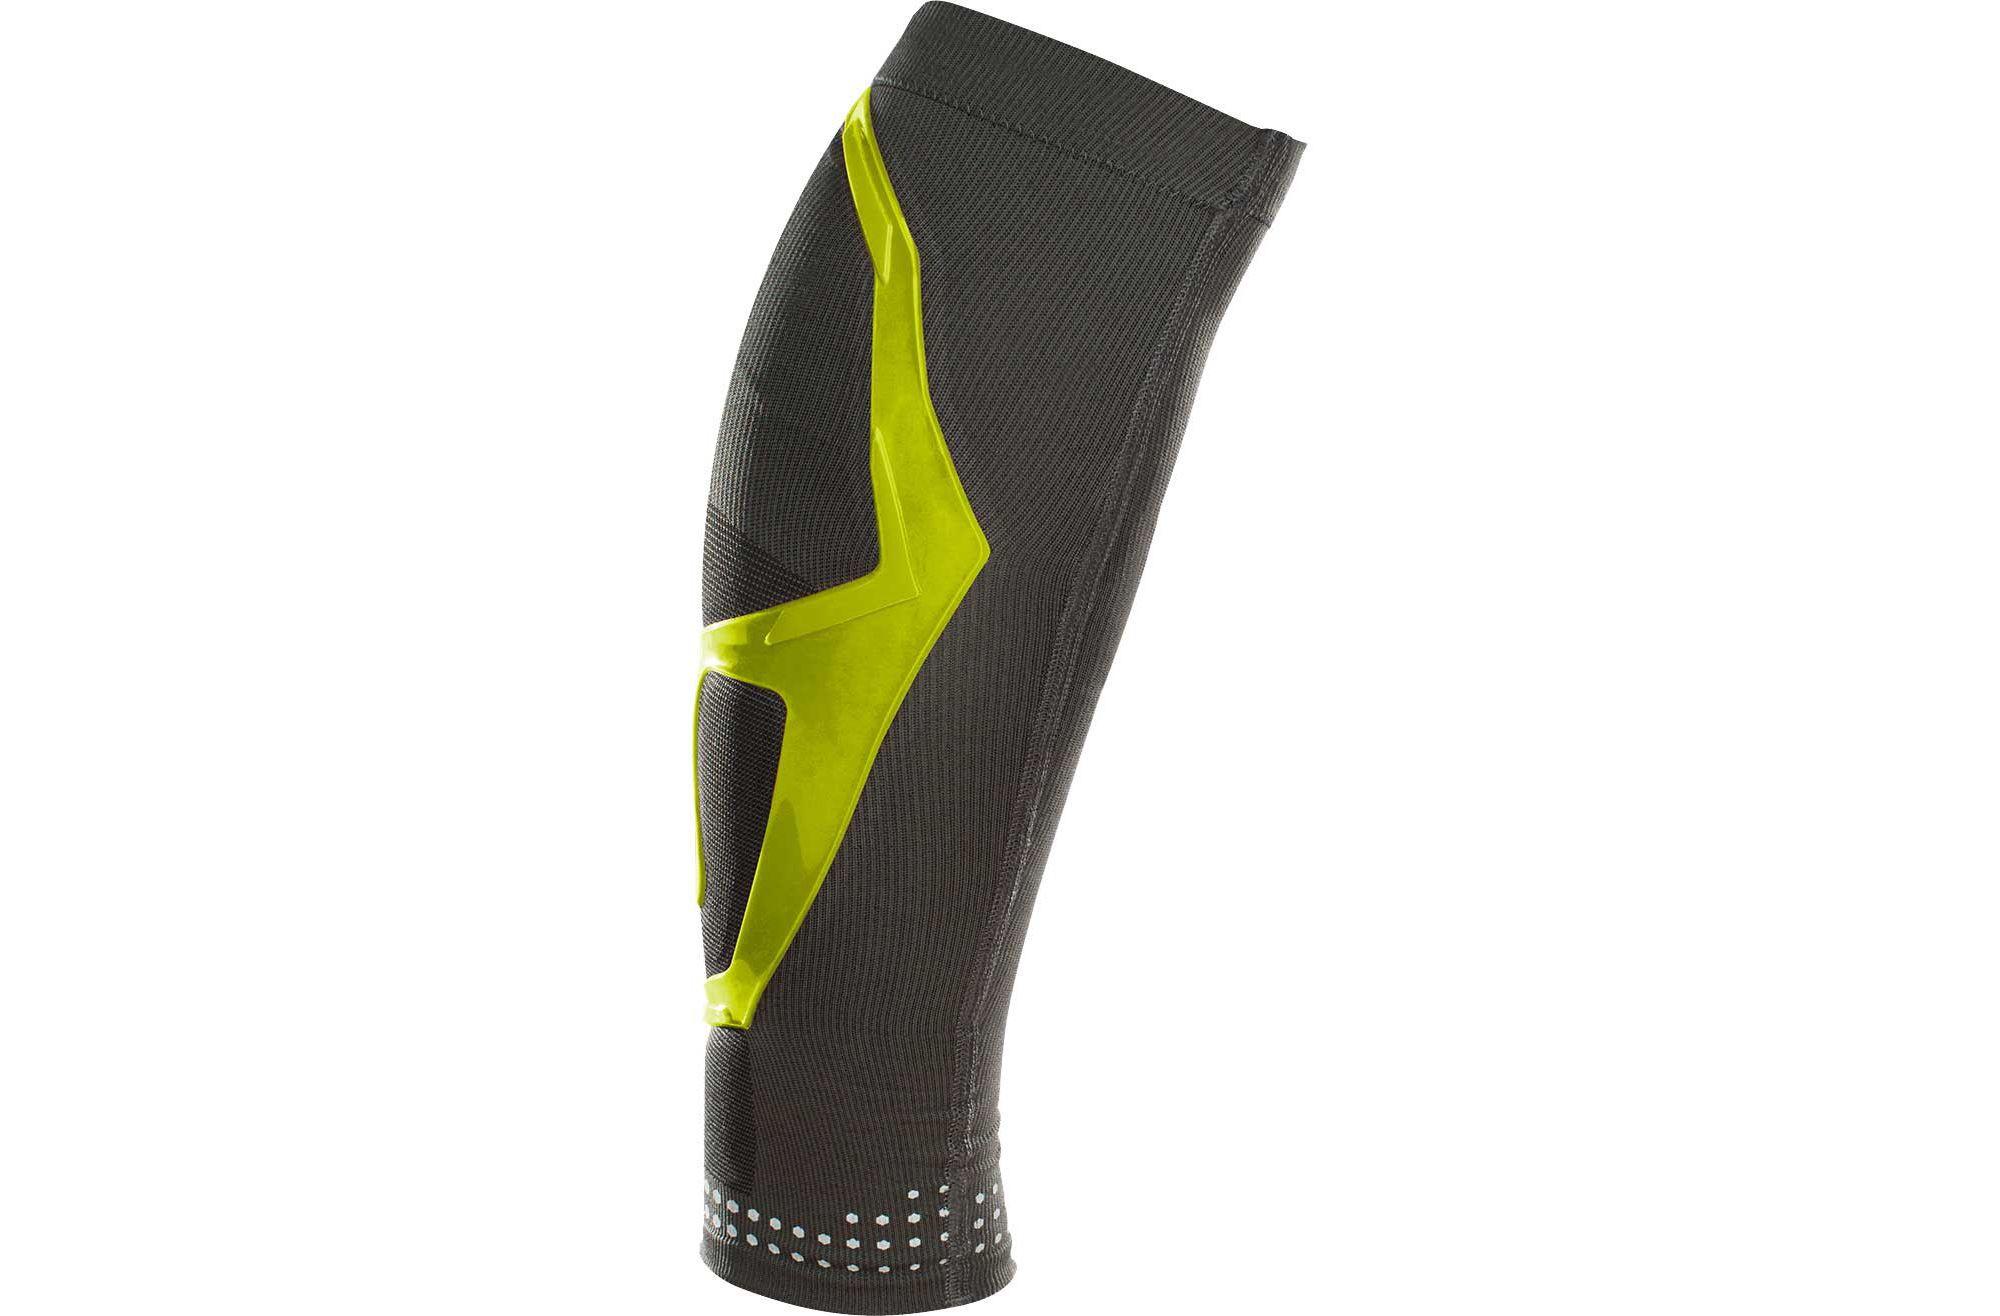 DonJoy PerformanceTriZone Calf Sleeve